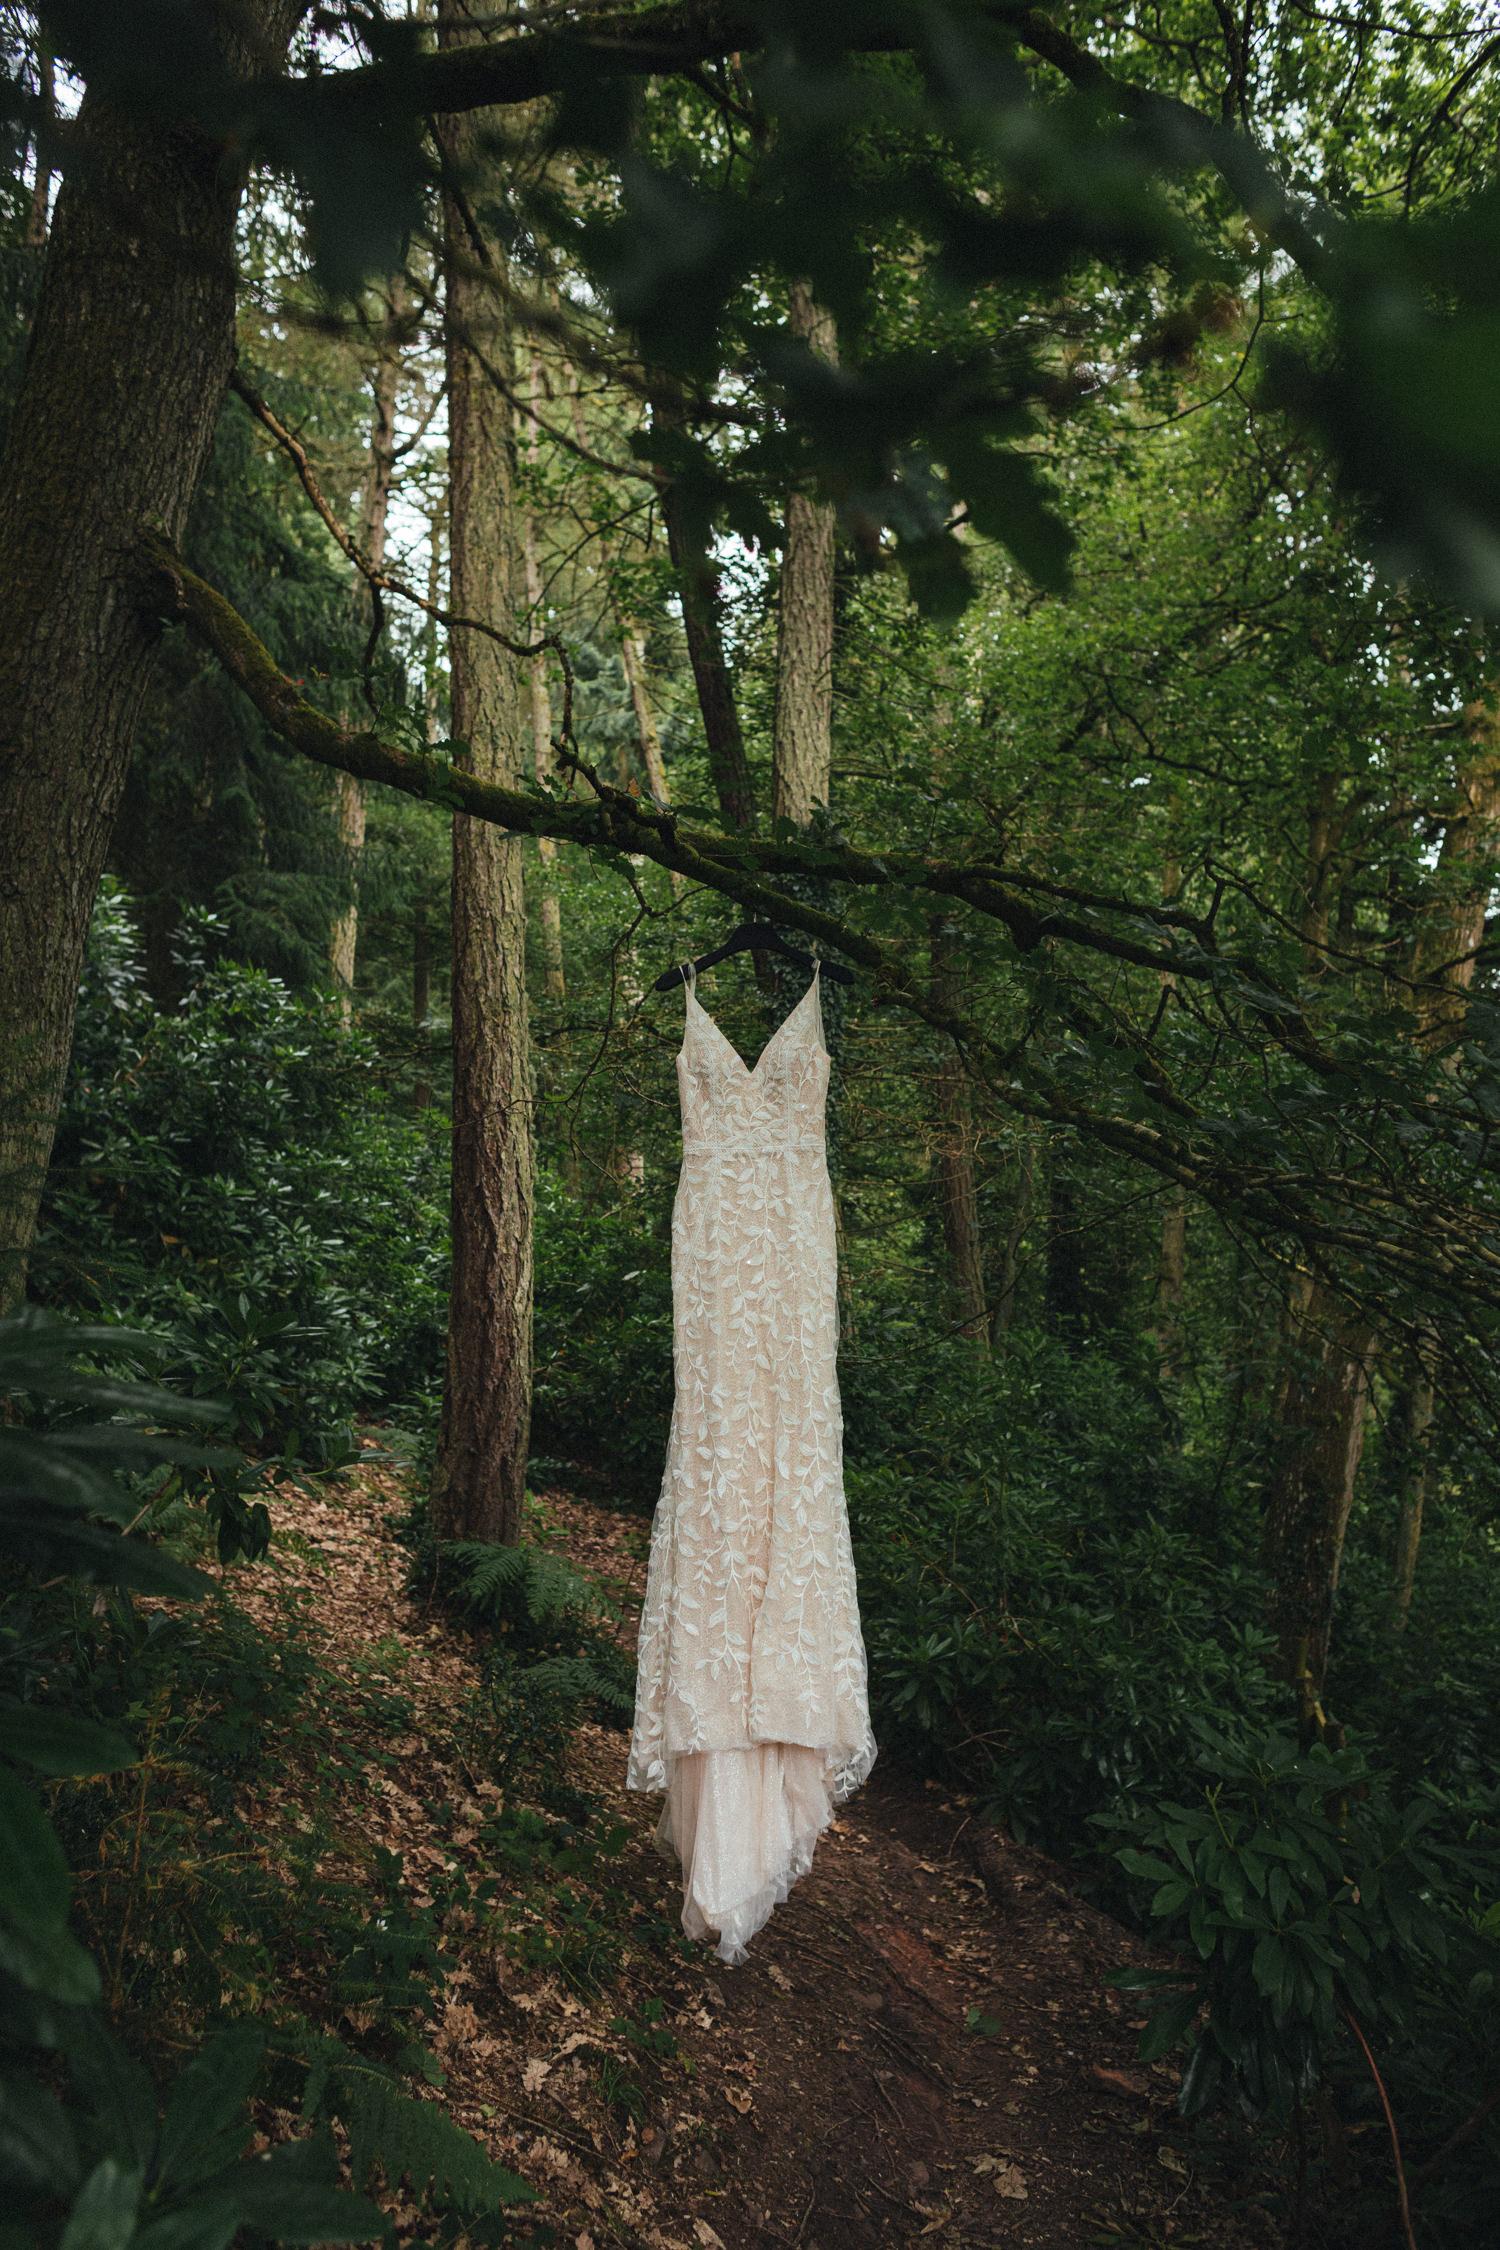 wedding dress, handmade wedding dress, woodland wedding, forest wedding, great wood camp, great wood camp wedding photography